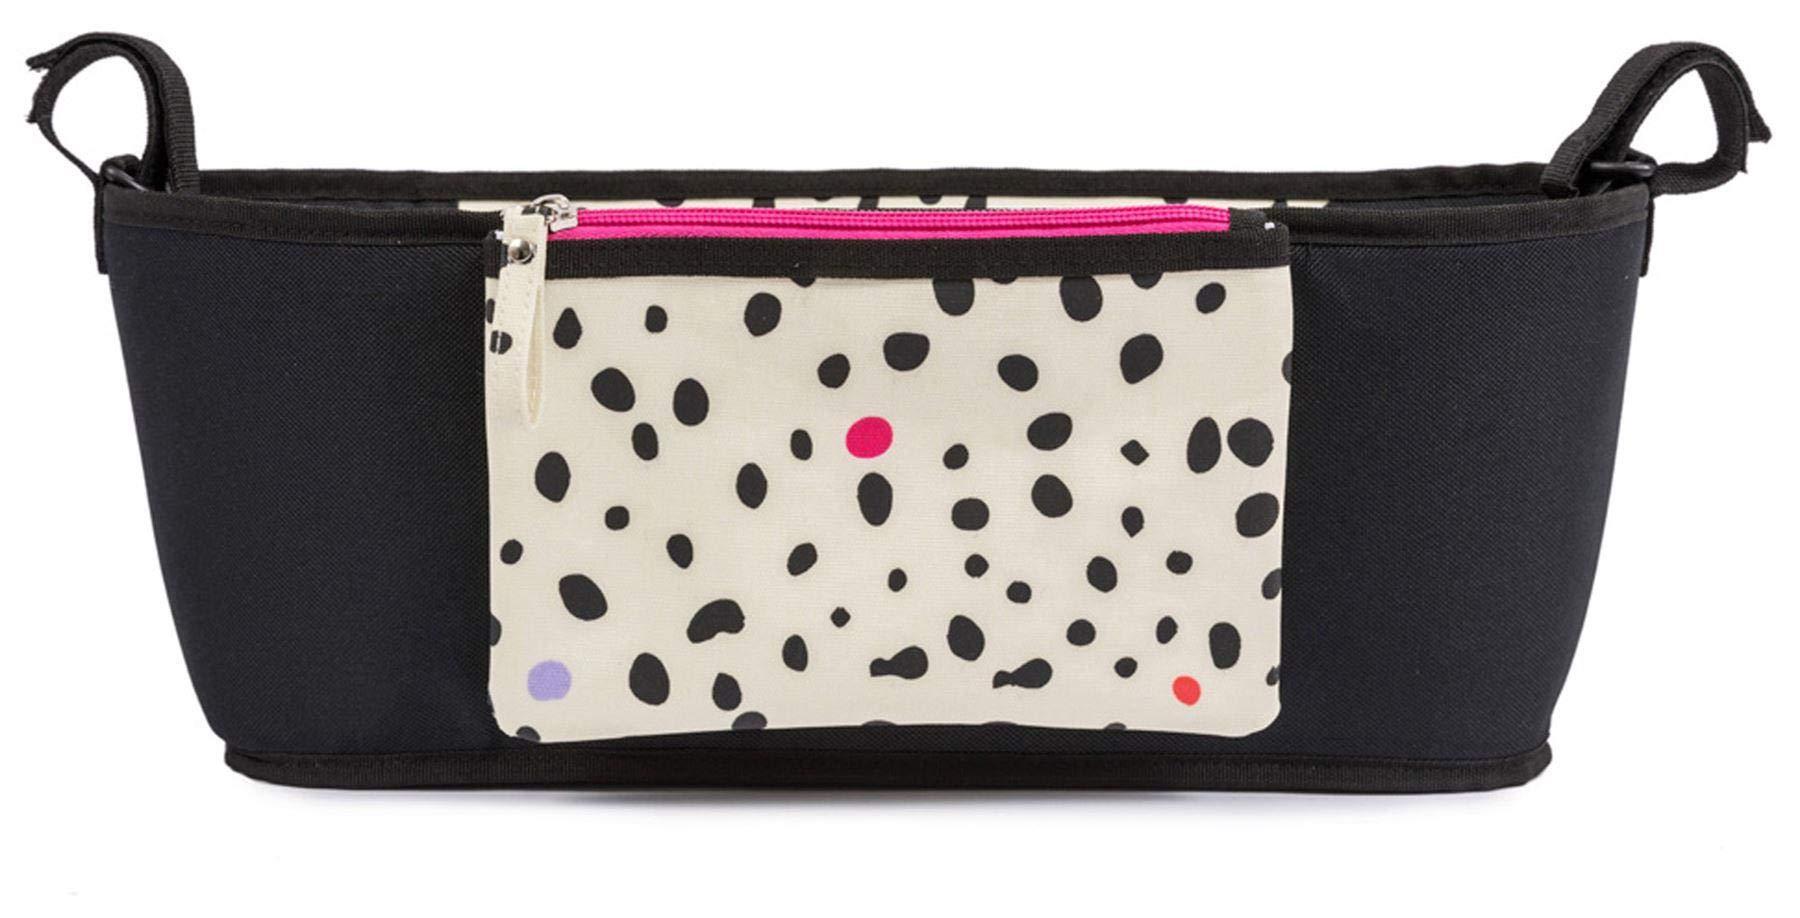 Pink Lining Stroller Organiser - Dalmatian Fever